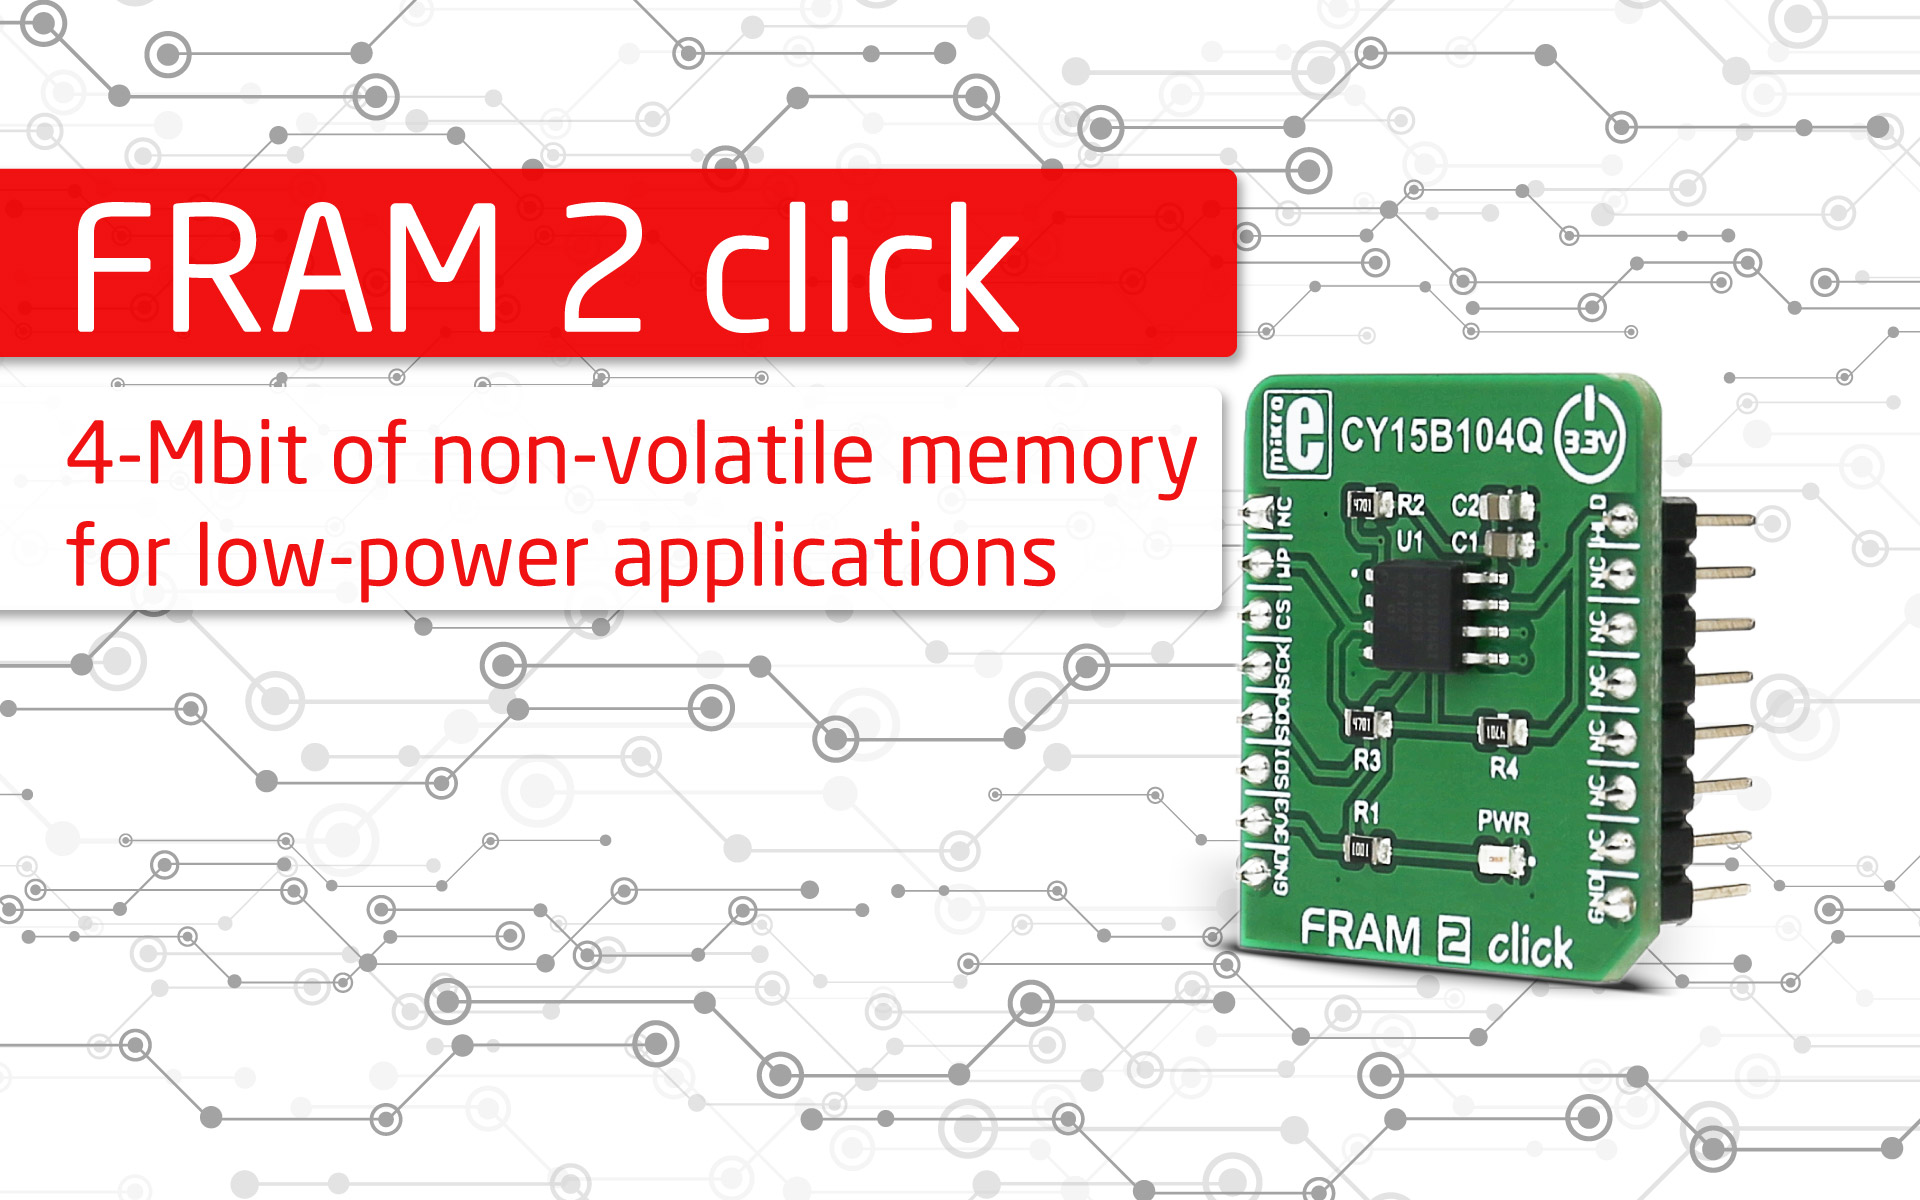 FRAM 2 click - Add 4-Mbit of non-volatile memory